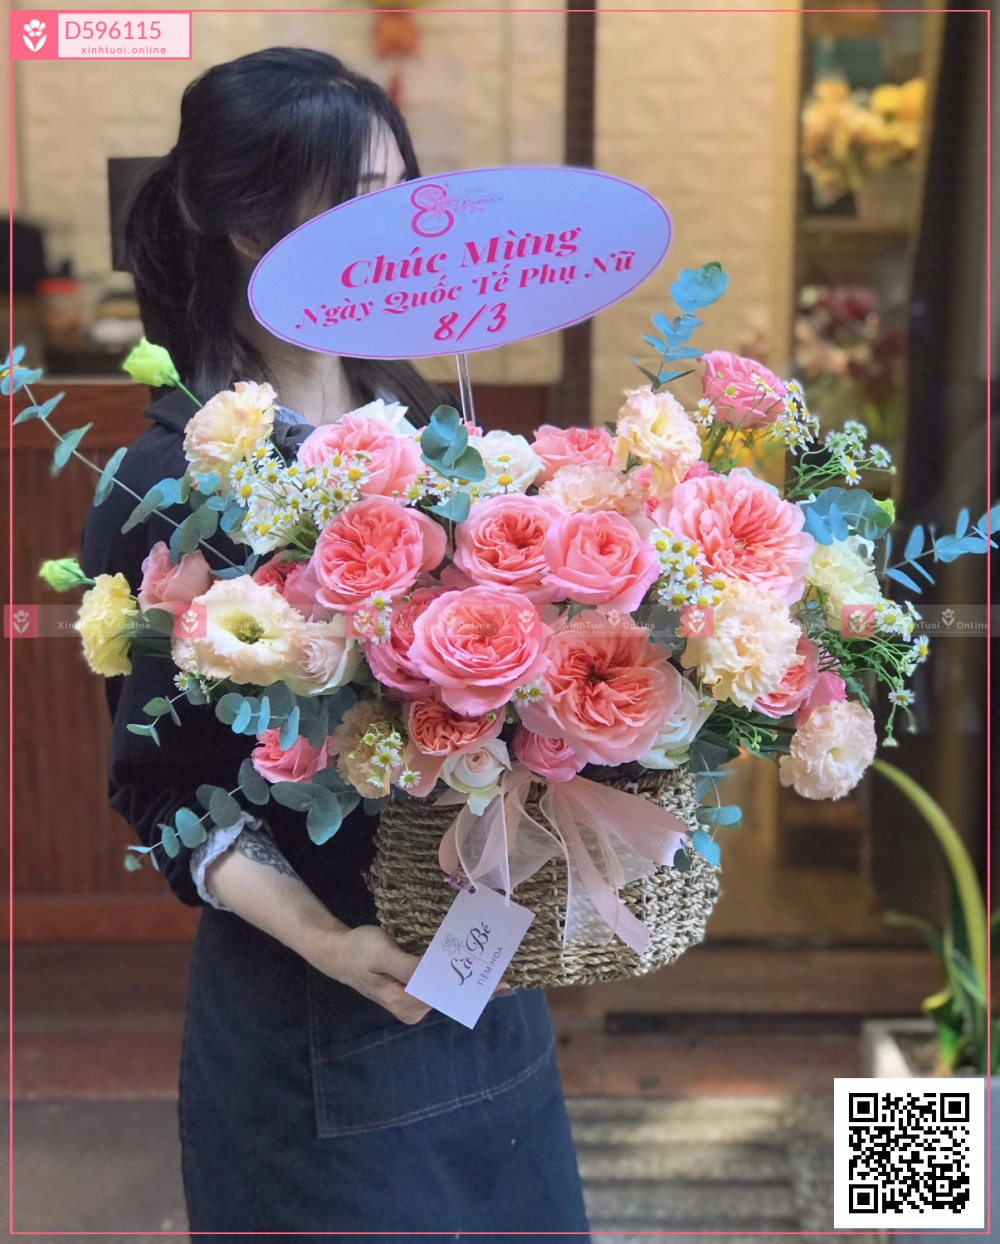 Princess ; International Women's Day ; Pretty ; Girls ; Baby ; Mommy - xinhtuoi.online